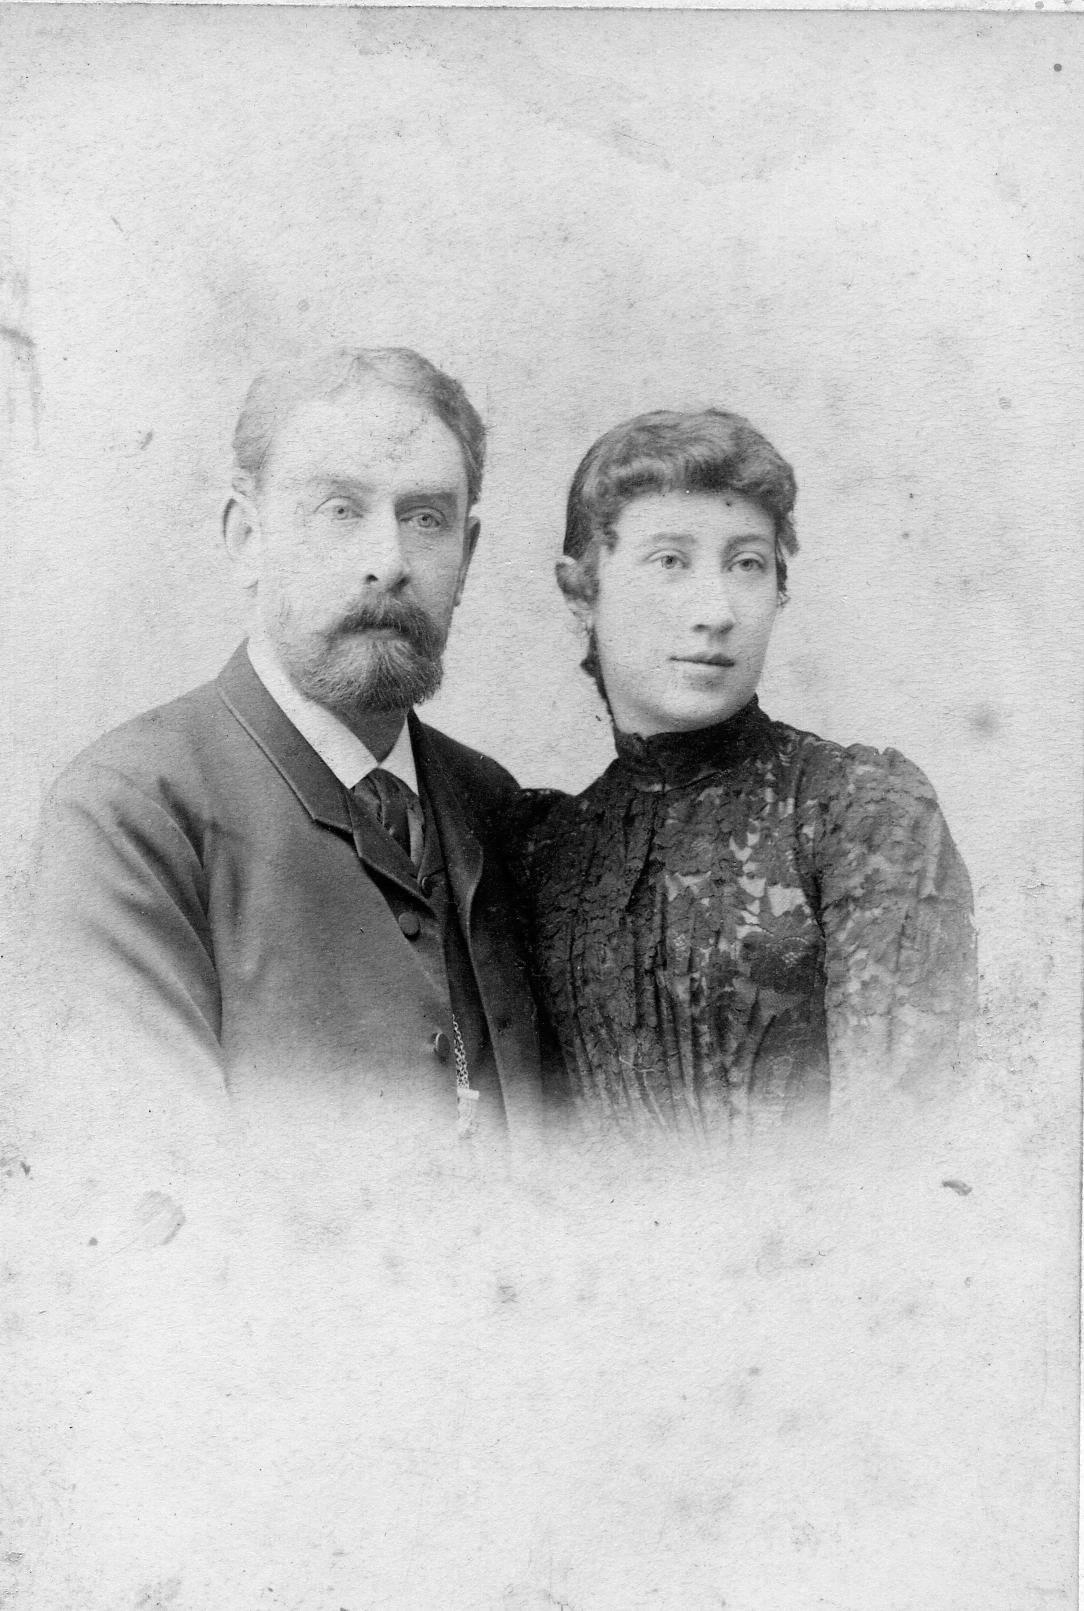 Николай Баташев и его жена Елизавета. Фото конца XIXв.